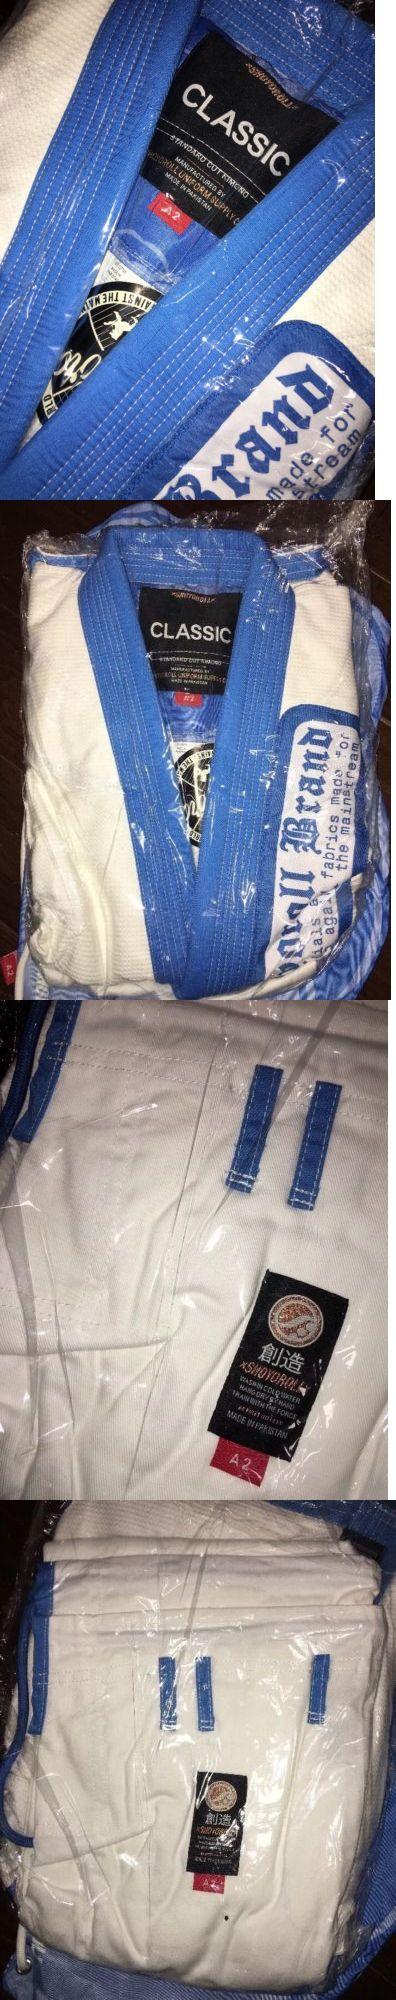 Uniforms and Gis 179774: Shoyoroll Clear Skies W/Blue Lapels A2 ***Bnib*** Uber Bjj Kimono -> BUY IT NOW ONLY: $450 on eBay!